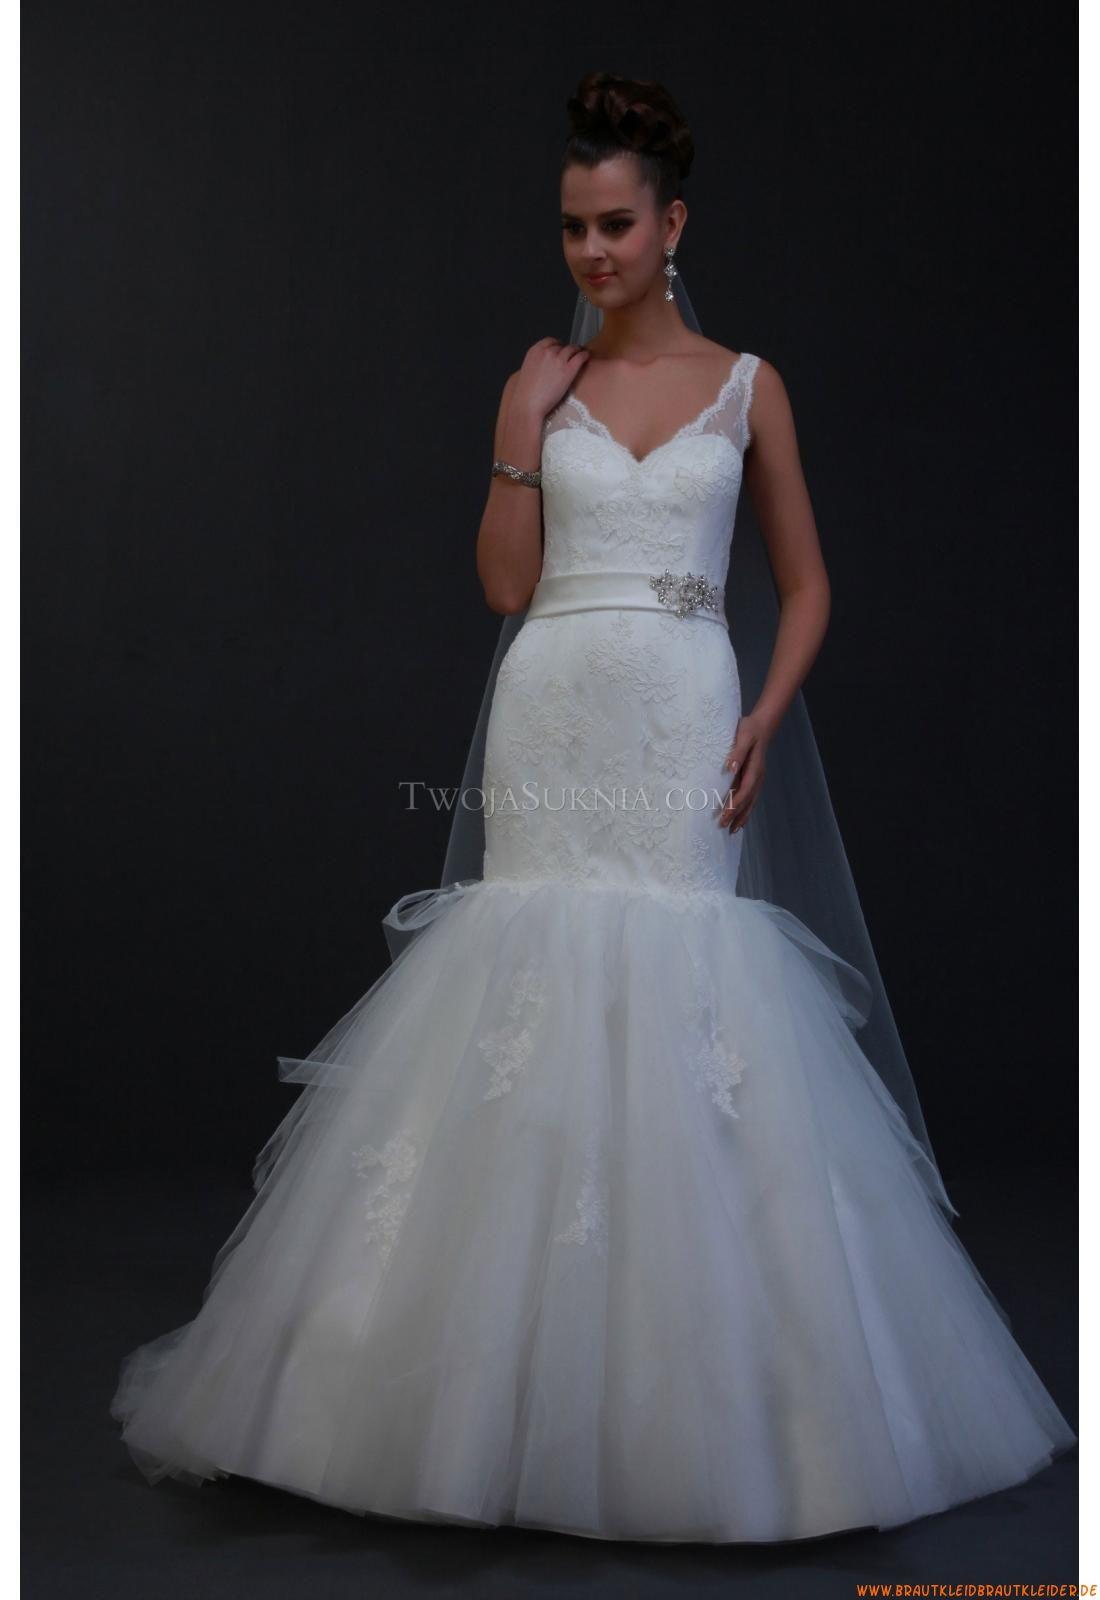 90+ abendkleider bern ideas   dresses, prom dresses, formal